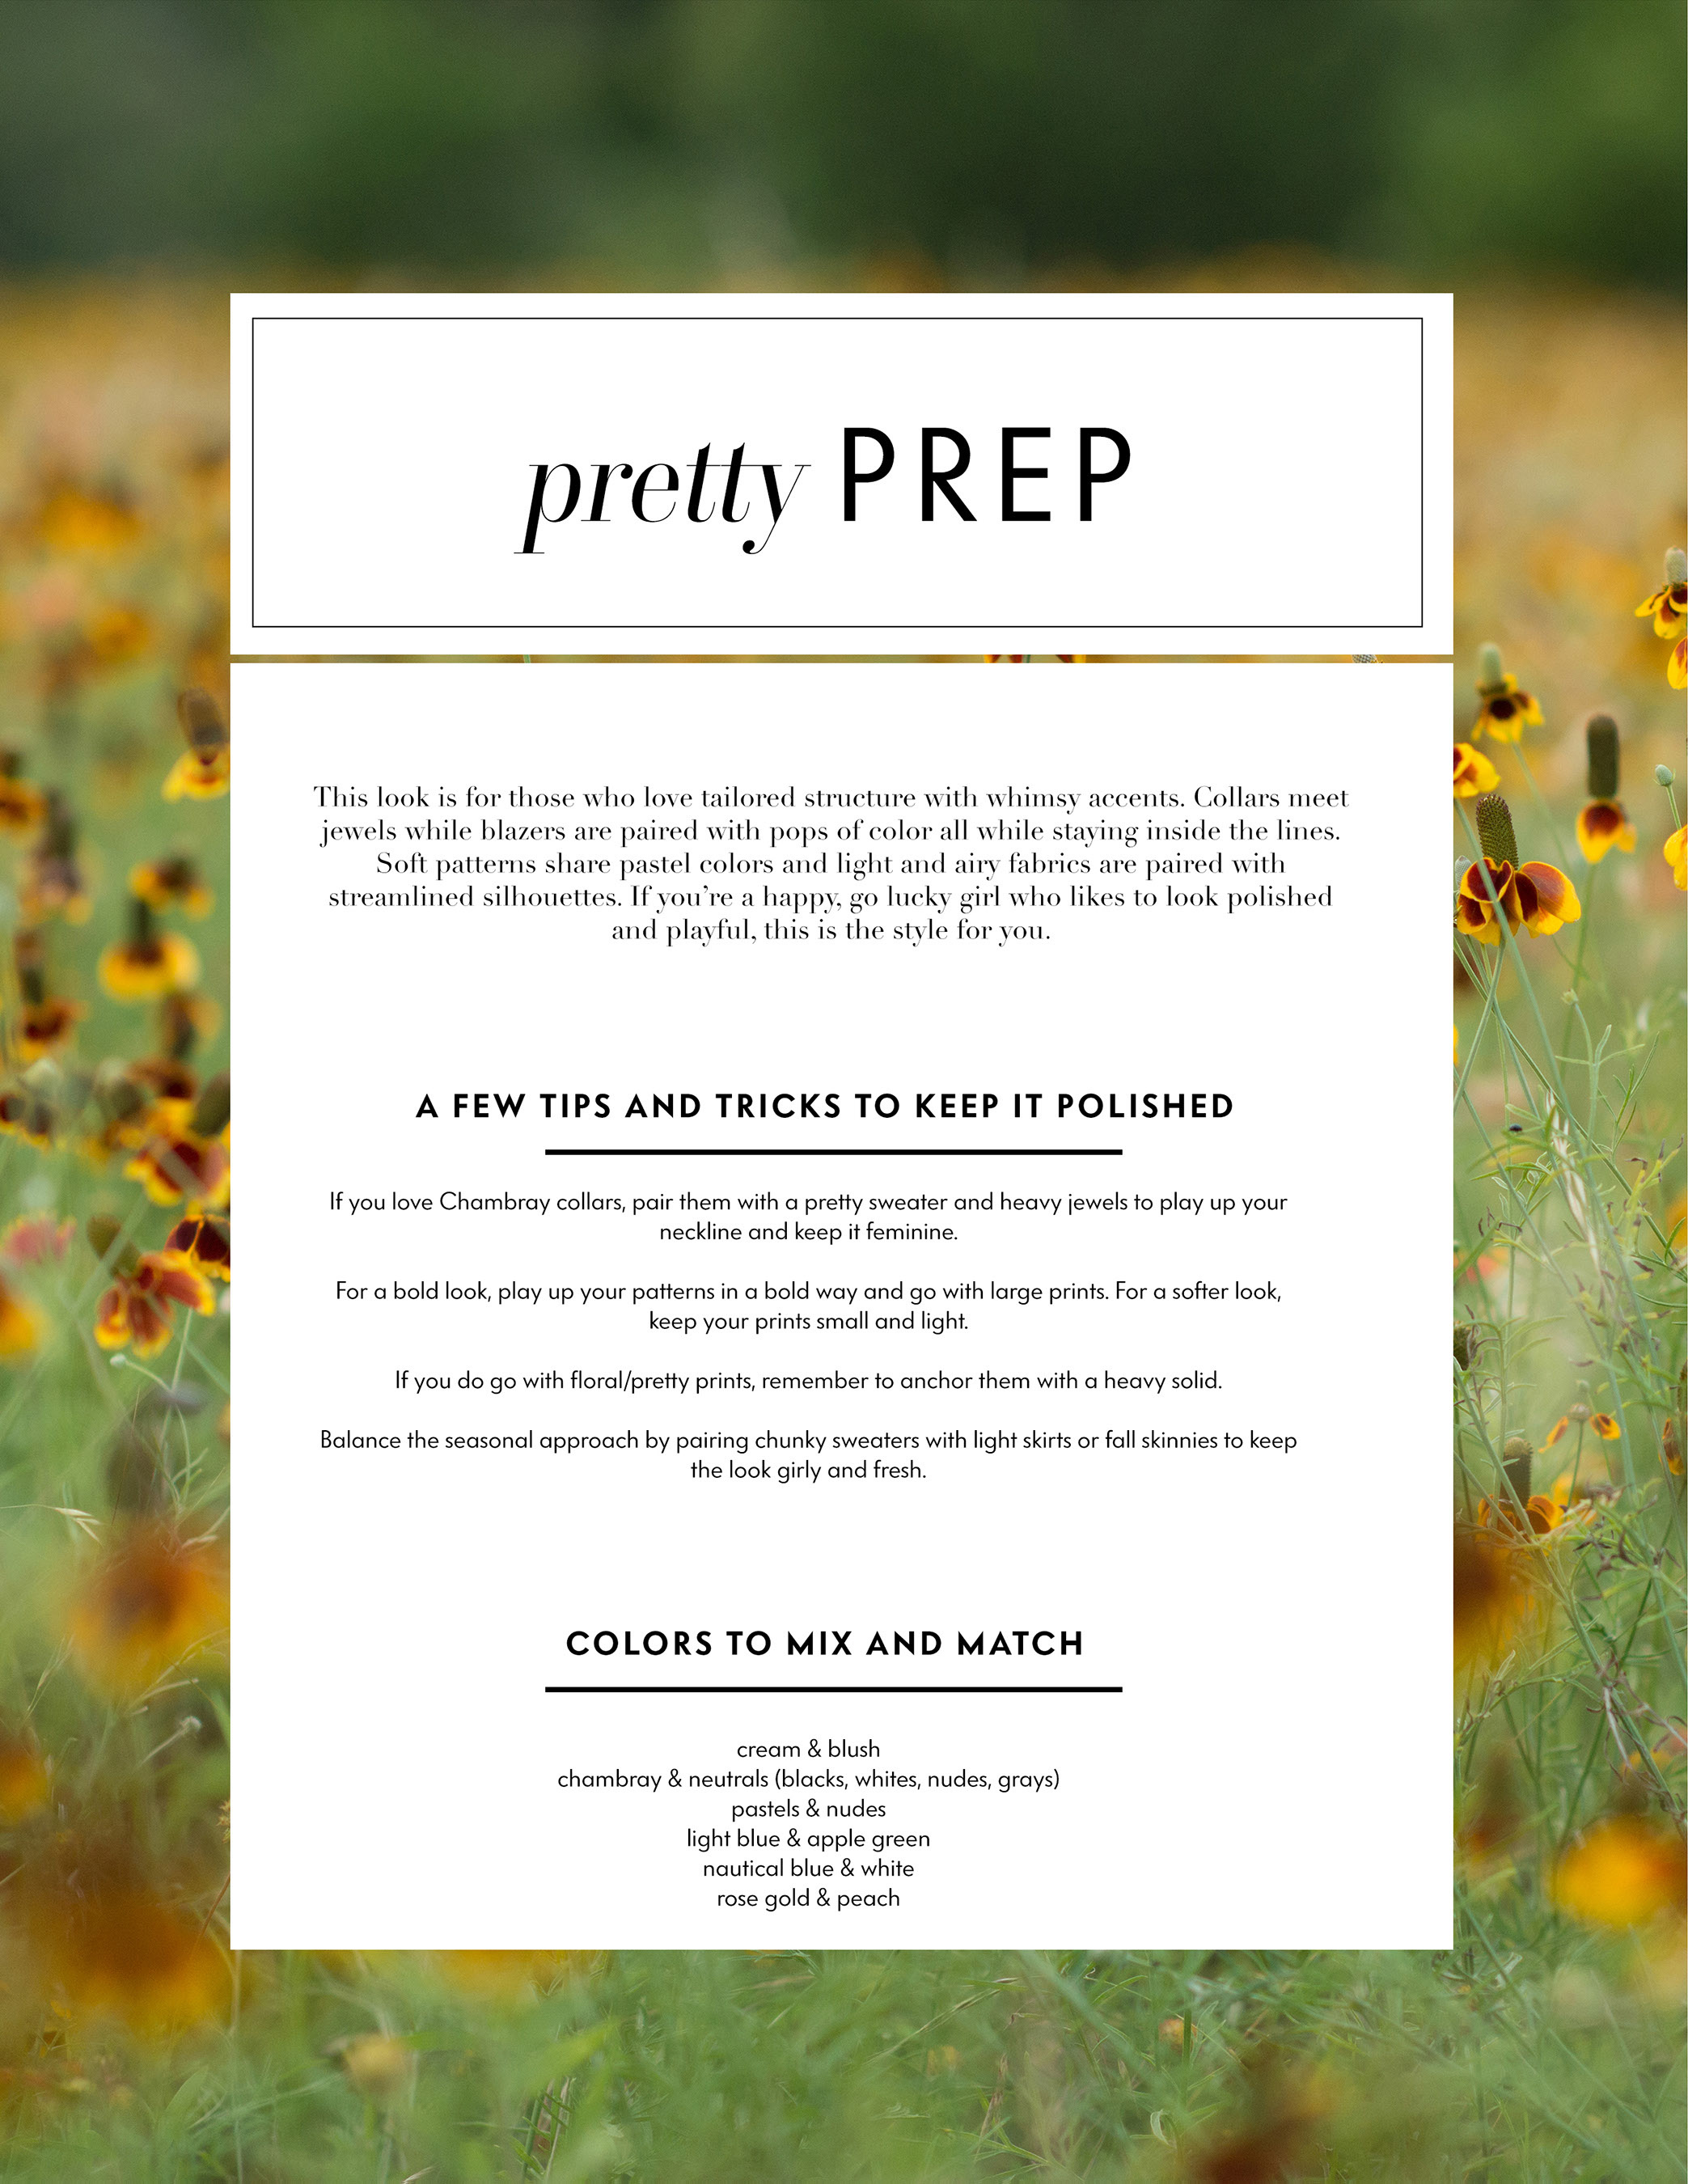 What to Wear Guide - Digital PDF-21-Left.jpg